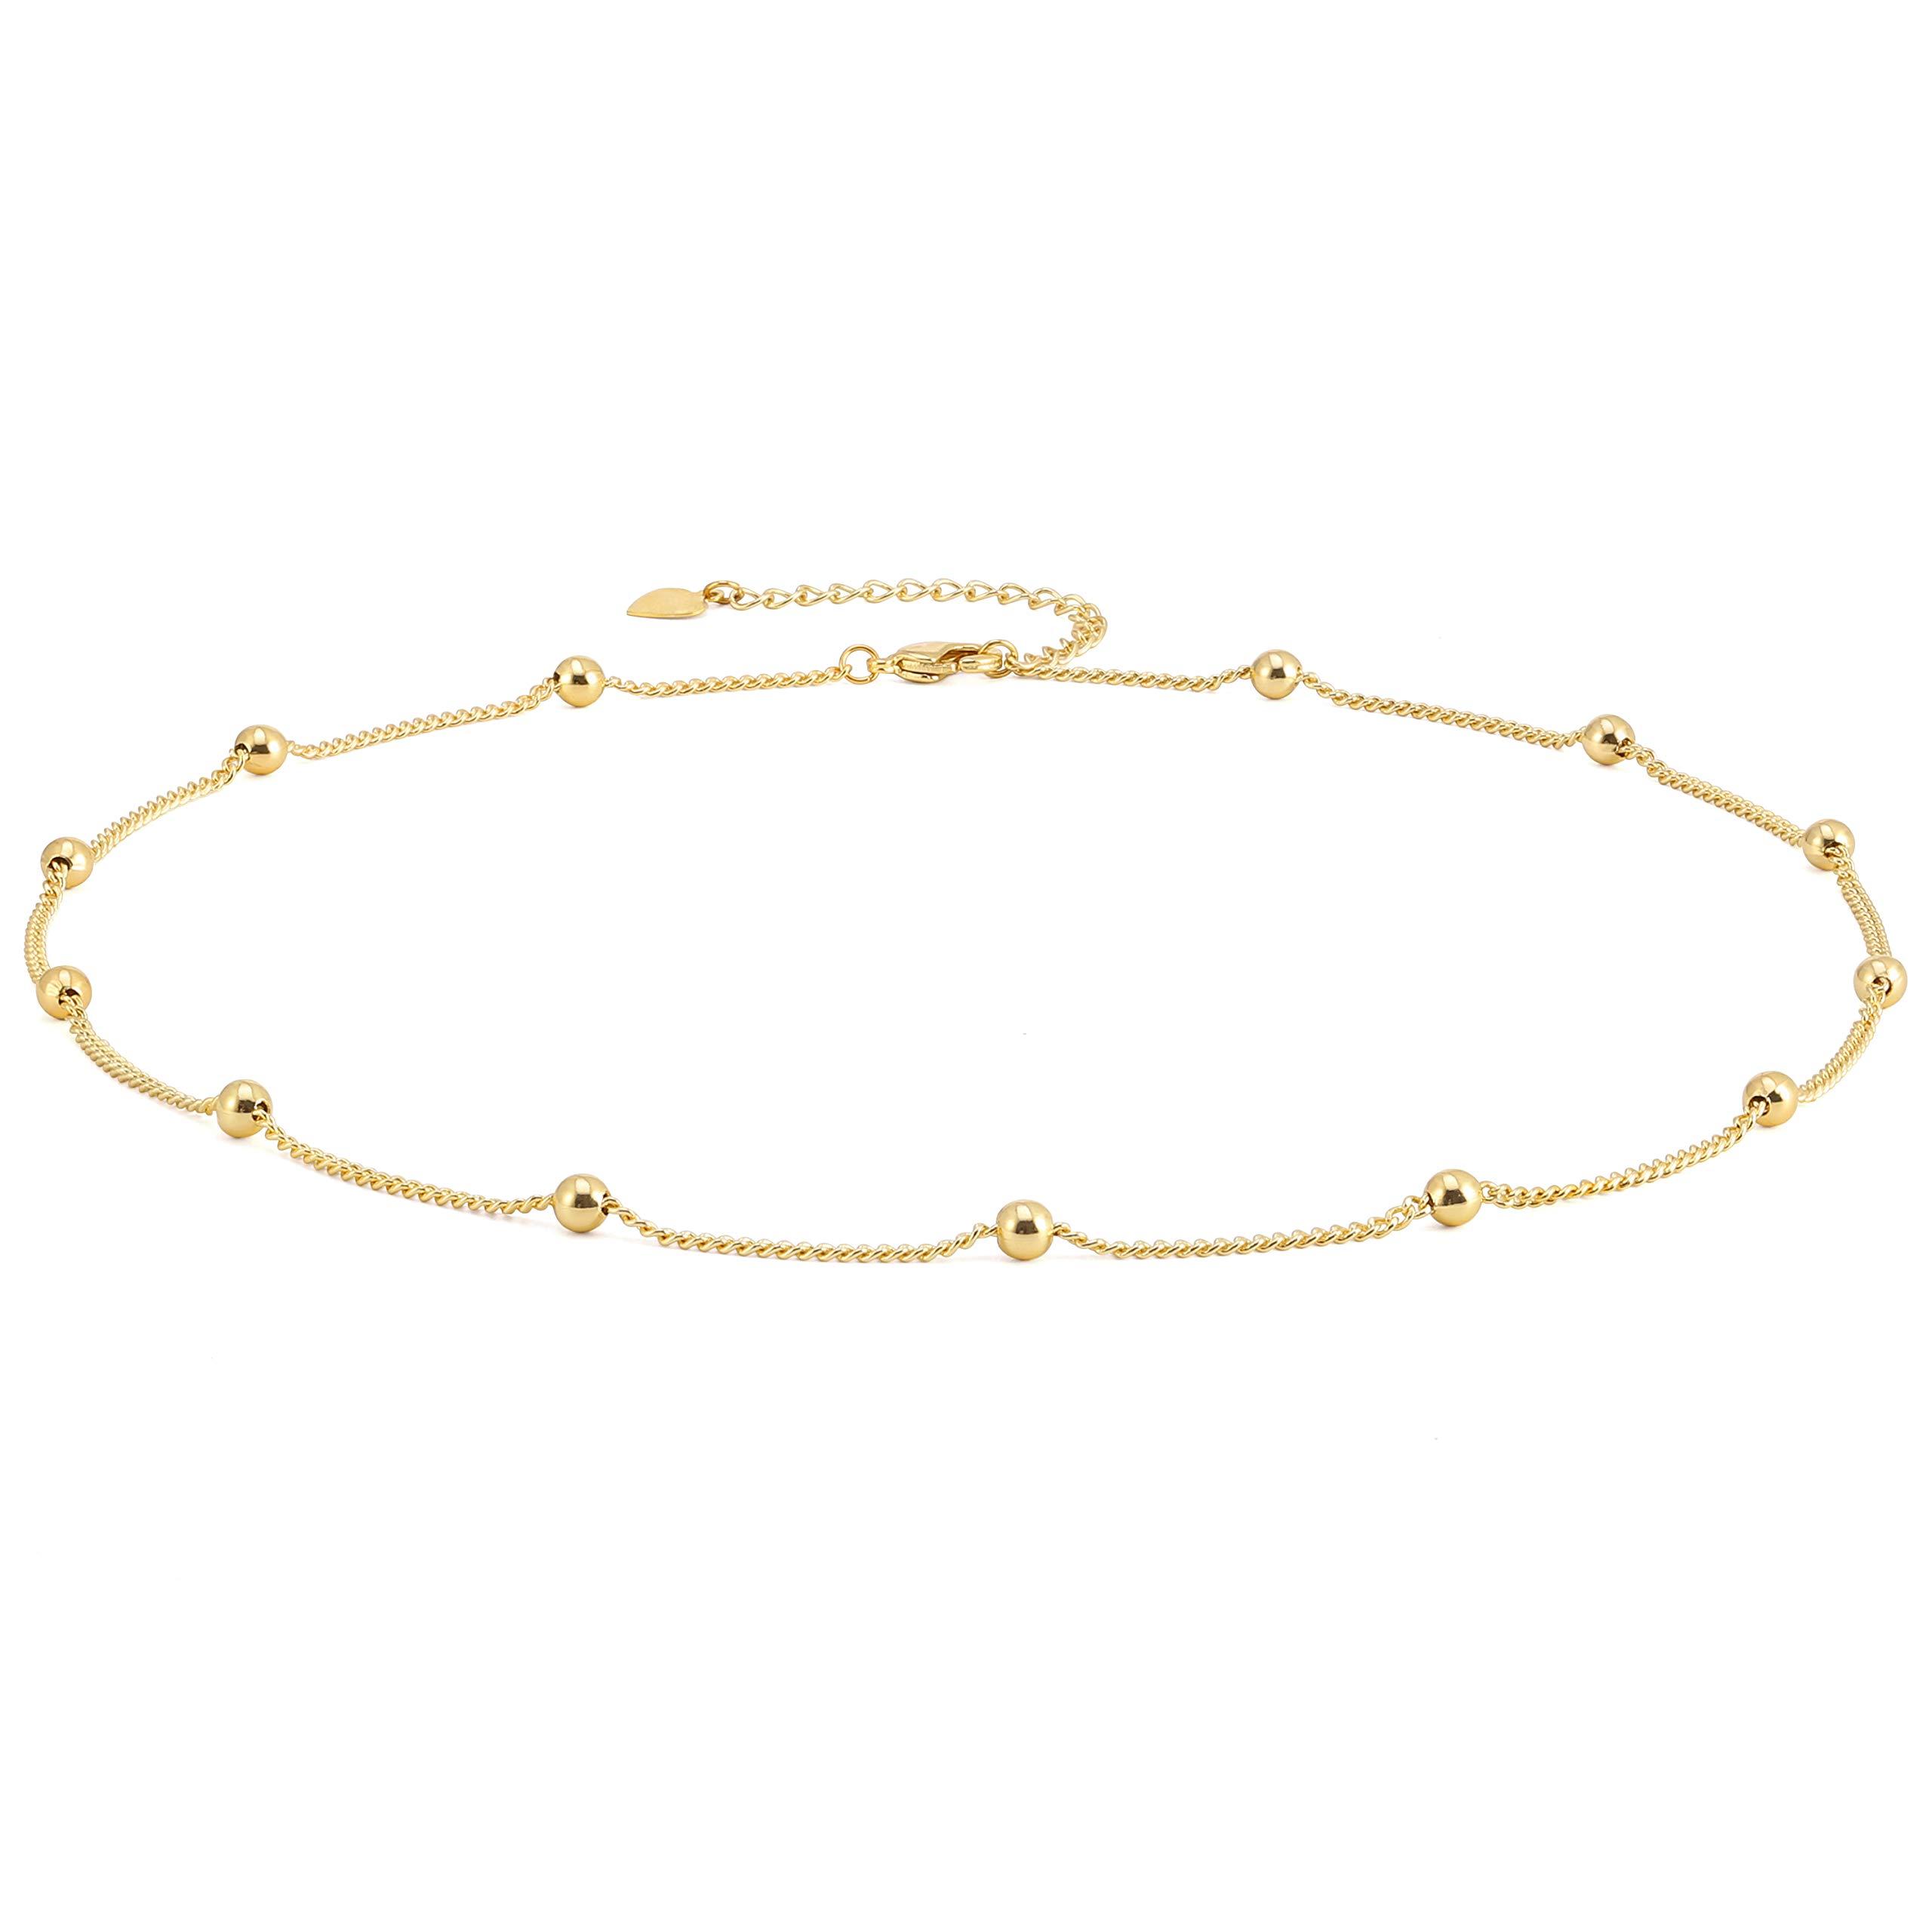 Satellite Chain Choker  Satellite Choker Necklace  Gold Satellite Necklace  Gold Satellite Choker  Gold Choker Necklace  Dainty Choker